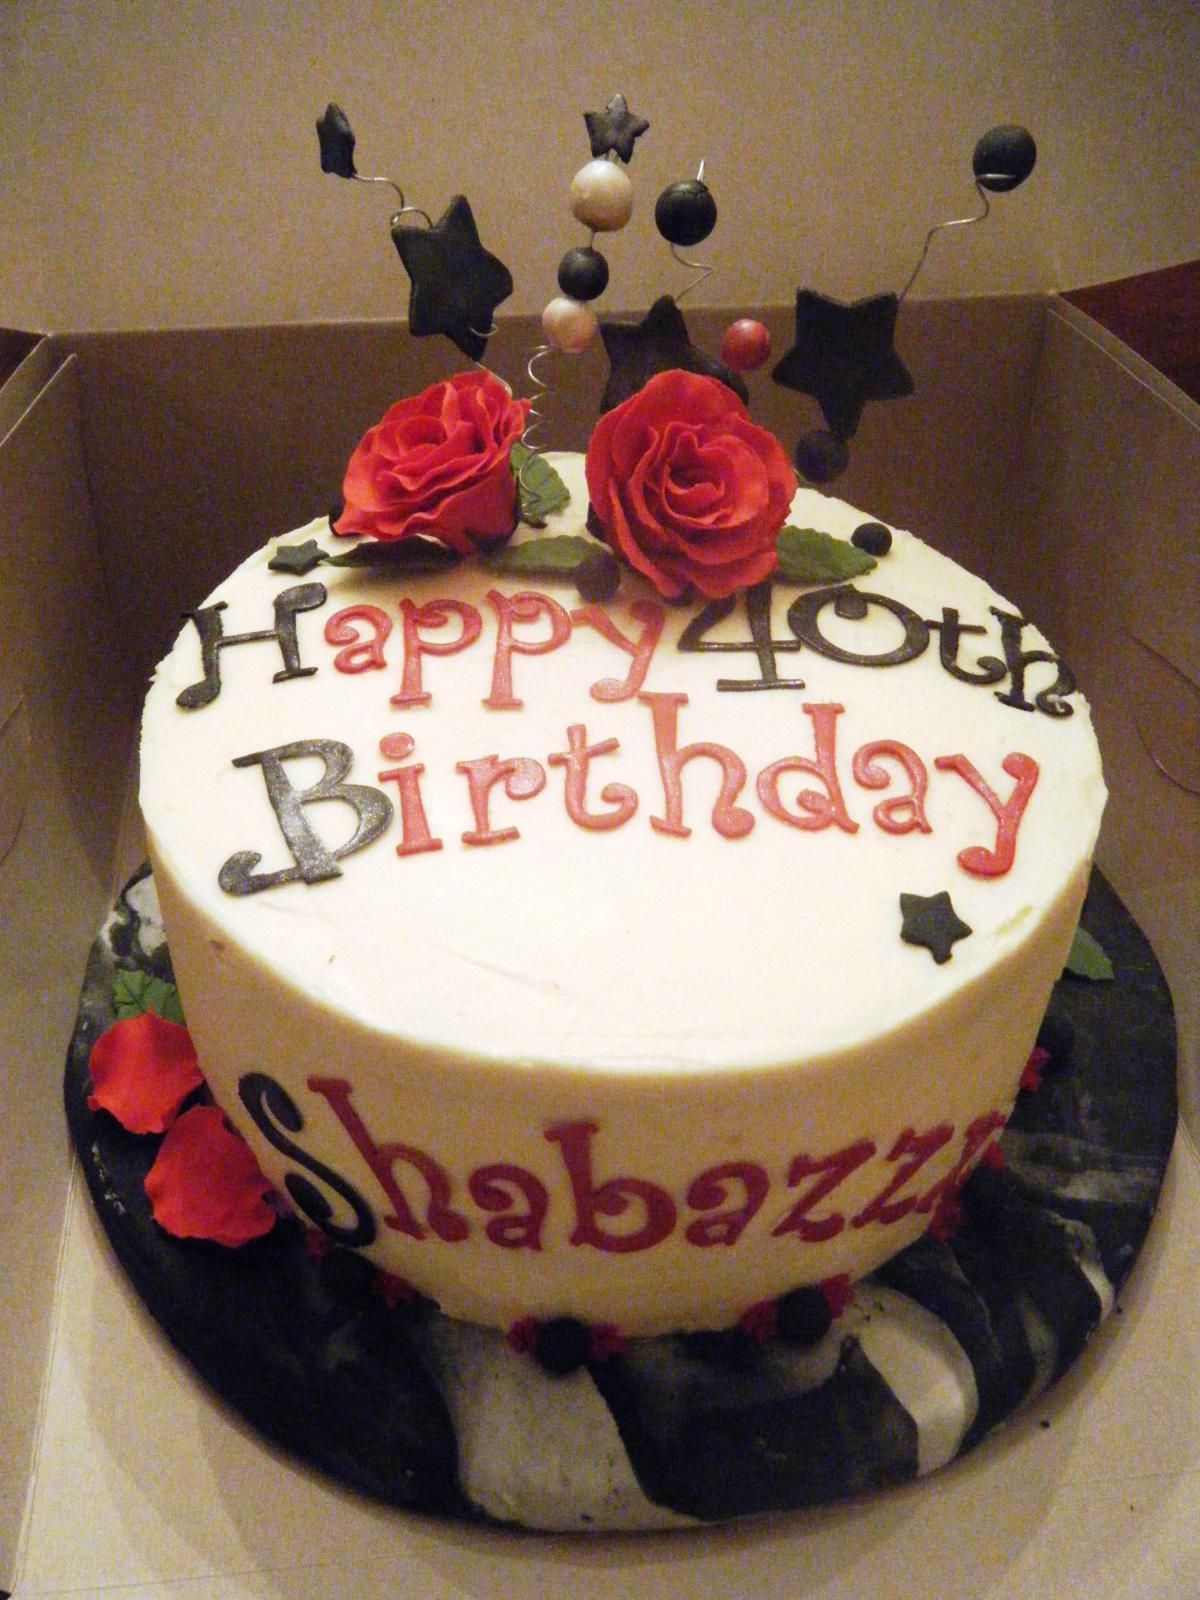 Birthday Cake Ideas For Men A 40th Female Protoblogr Design